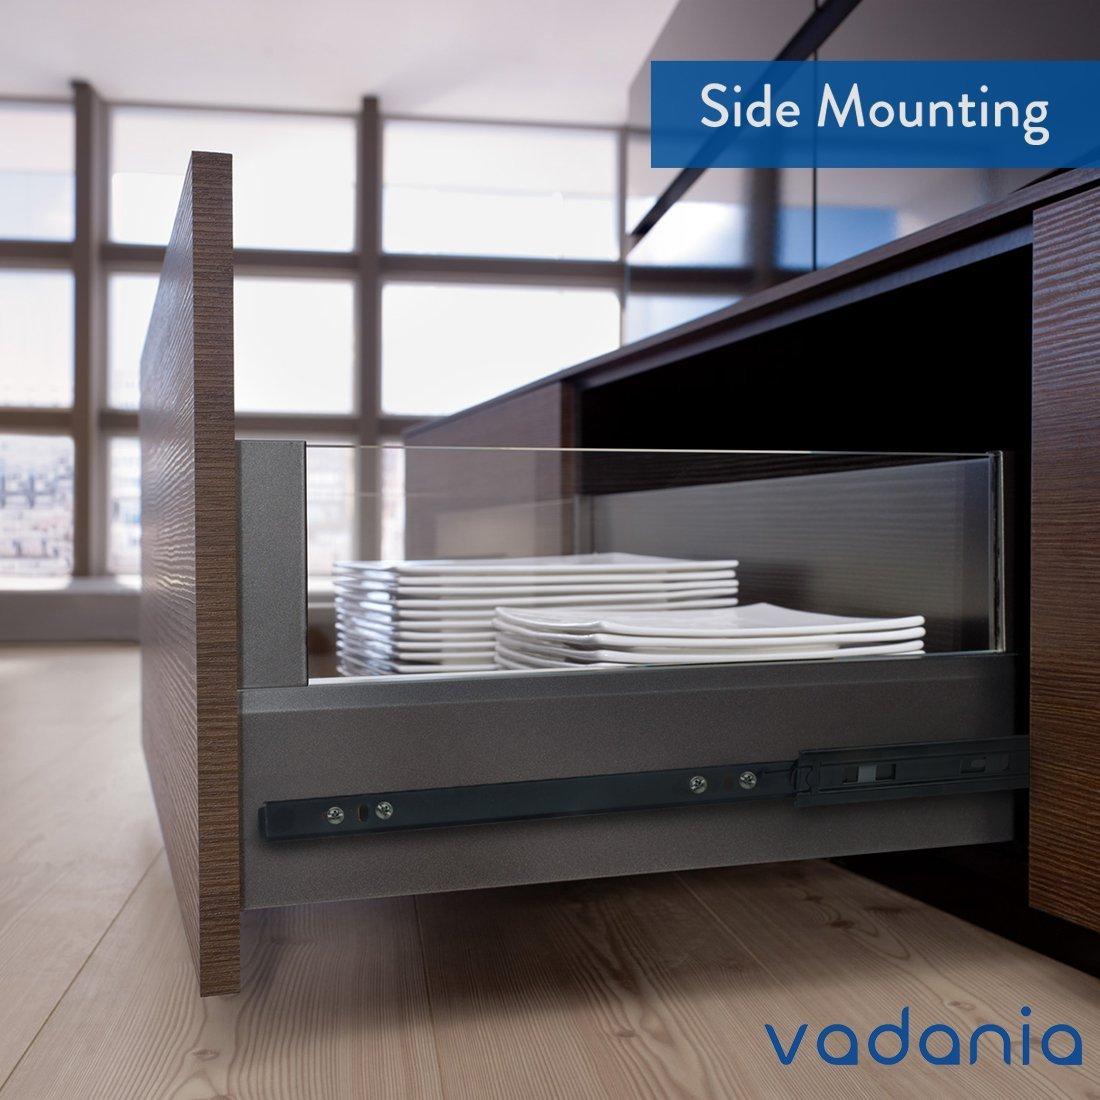 vadania VF1245 drawer slides